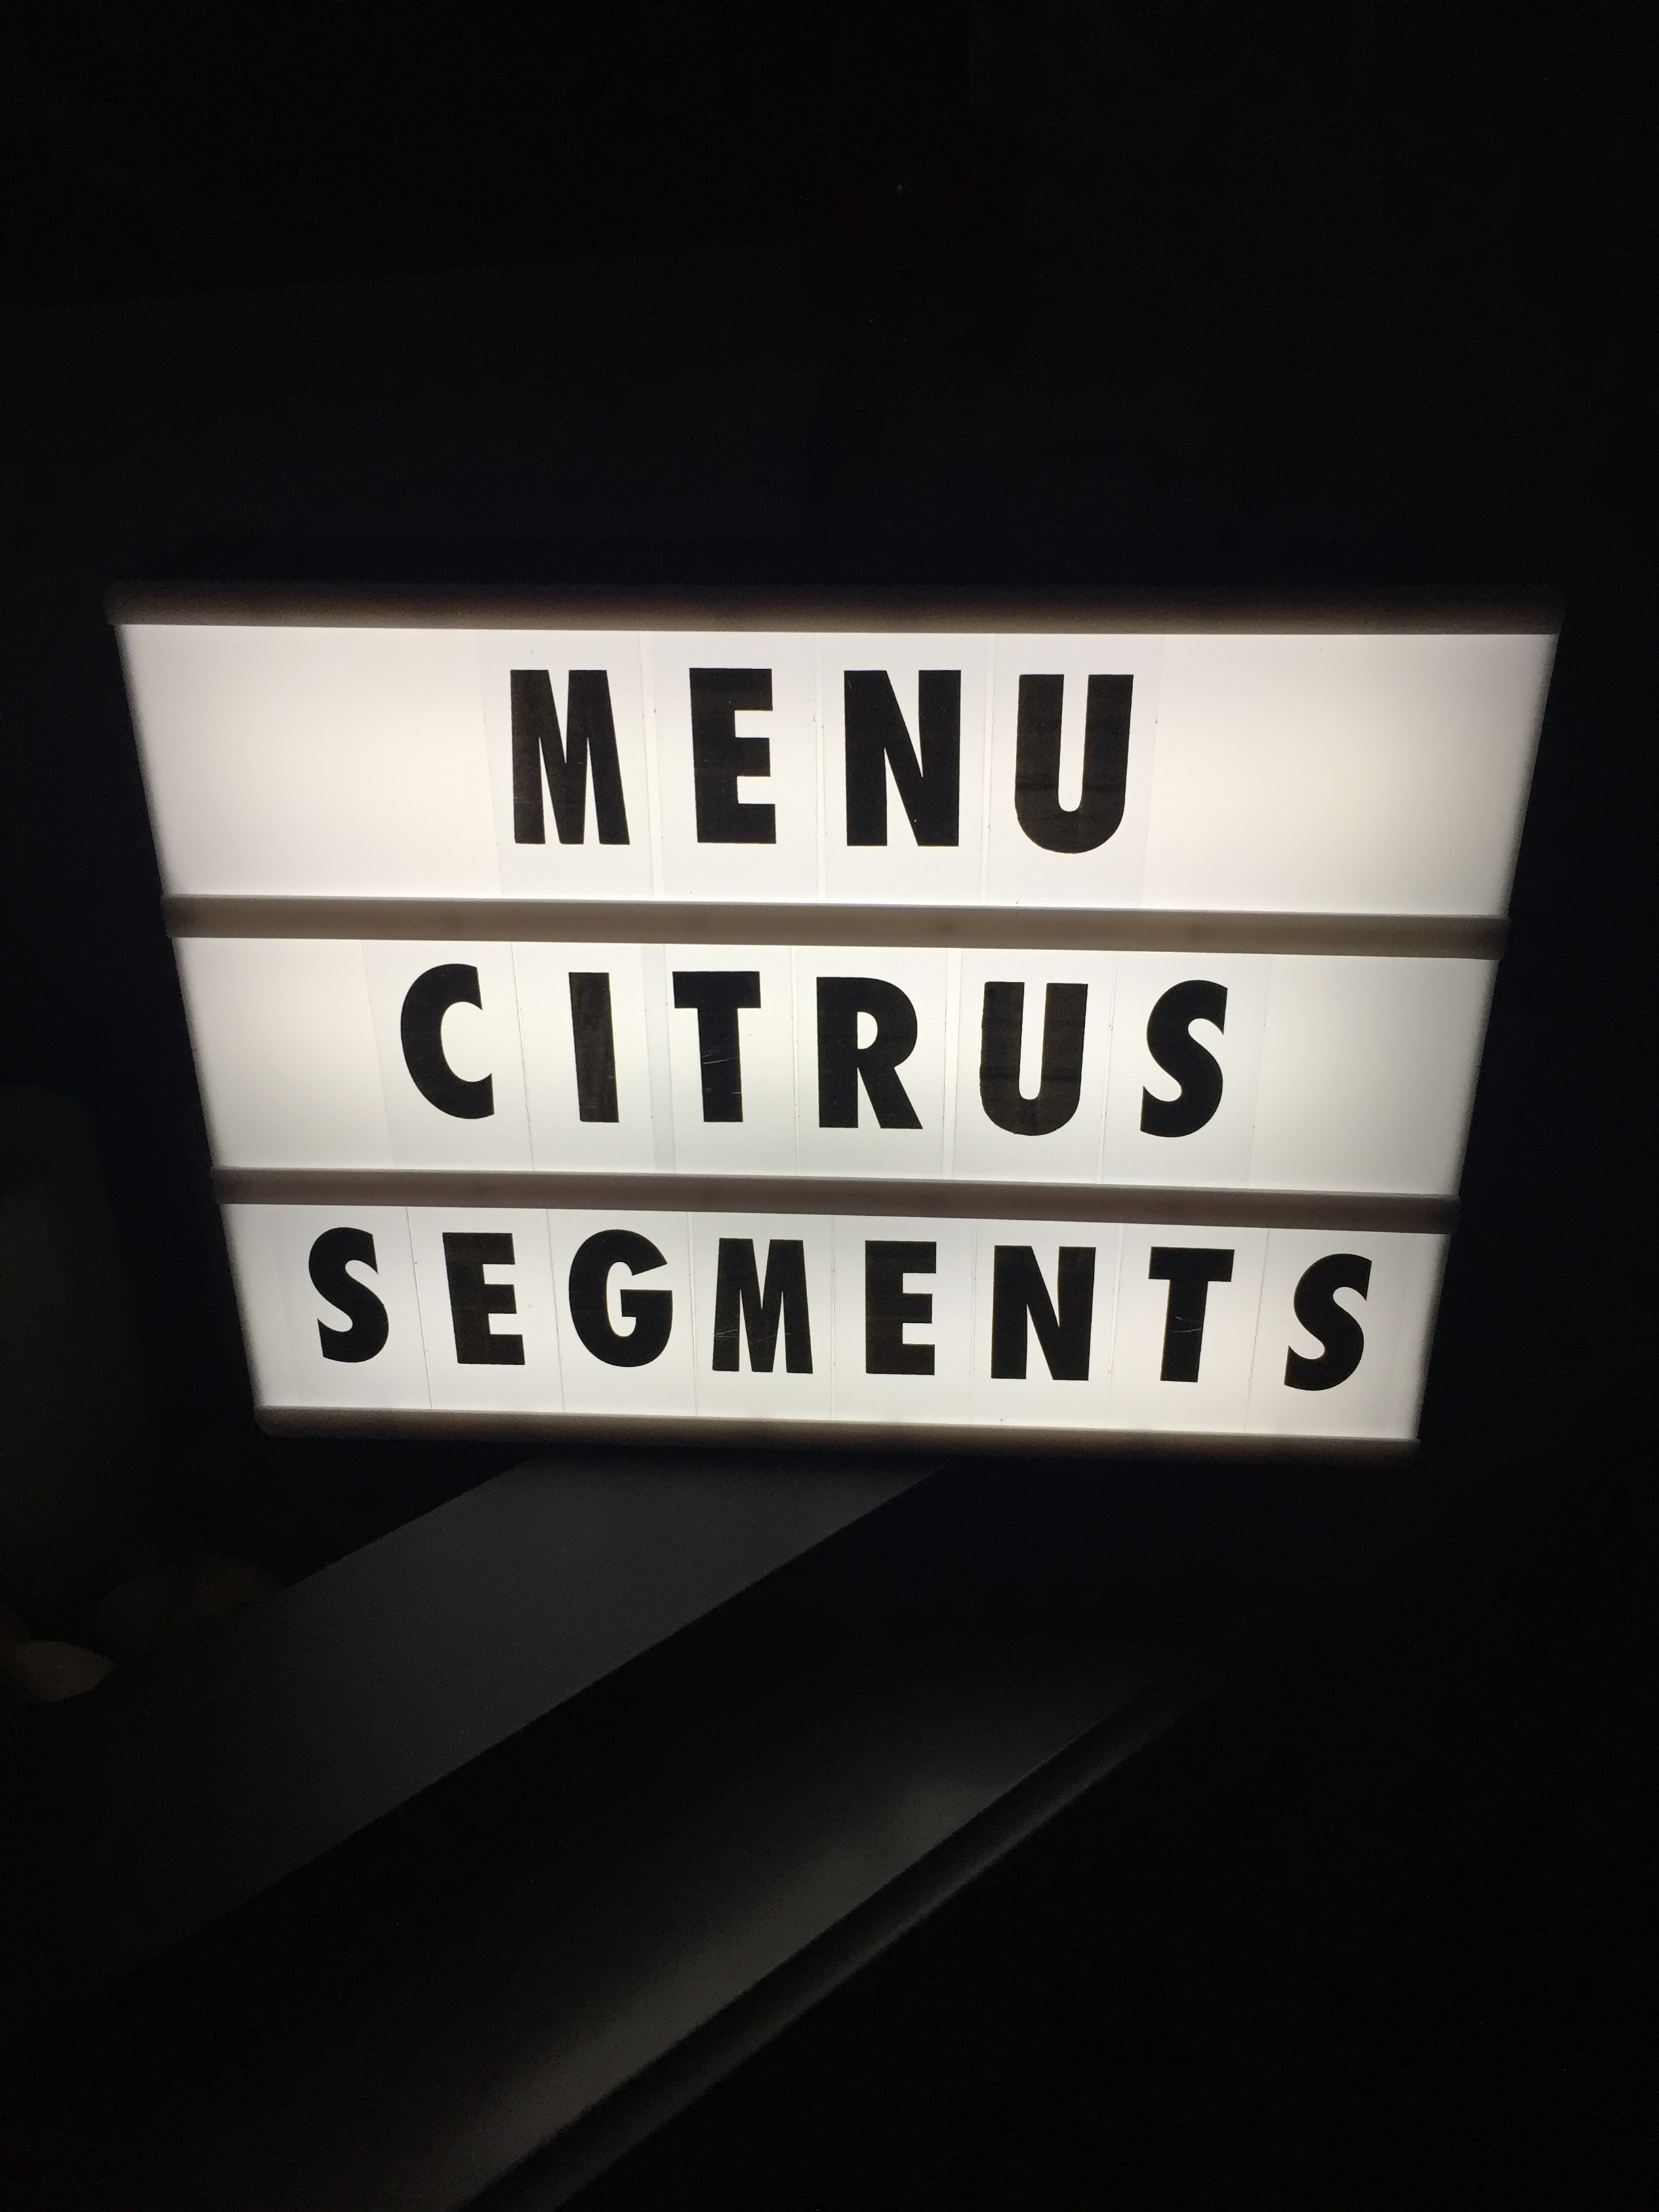 79CirtusSegments1.JPG